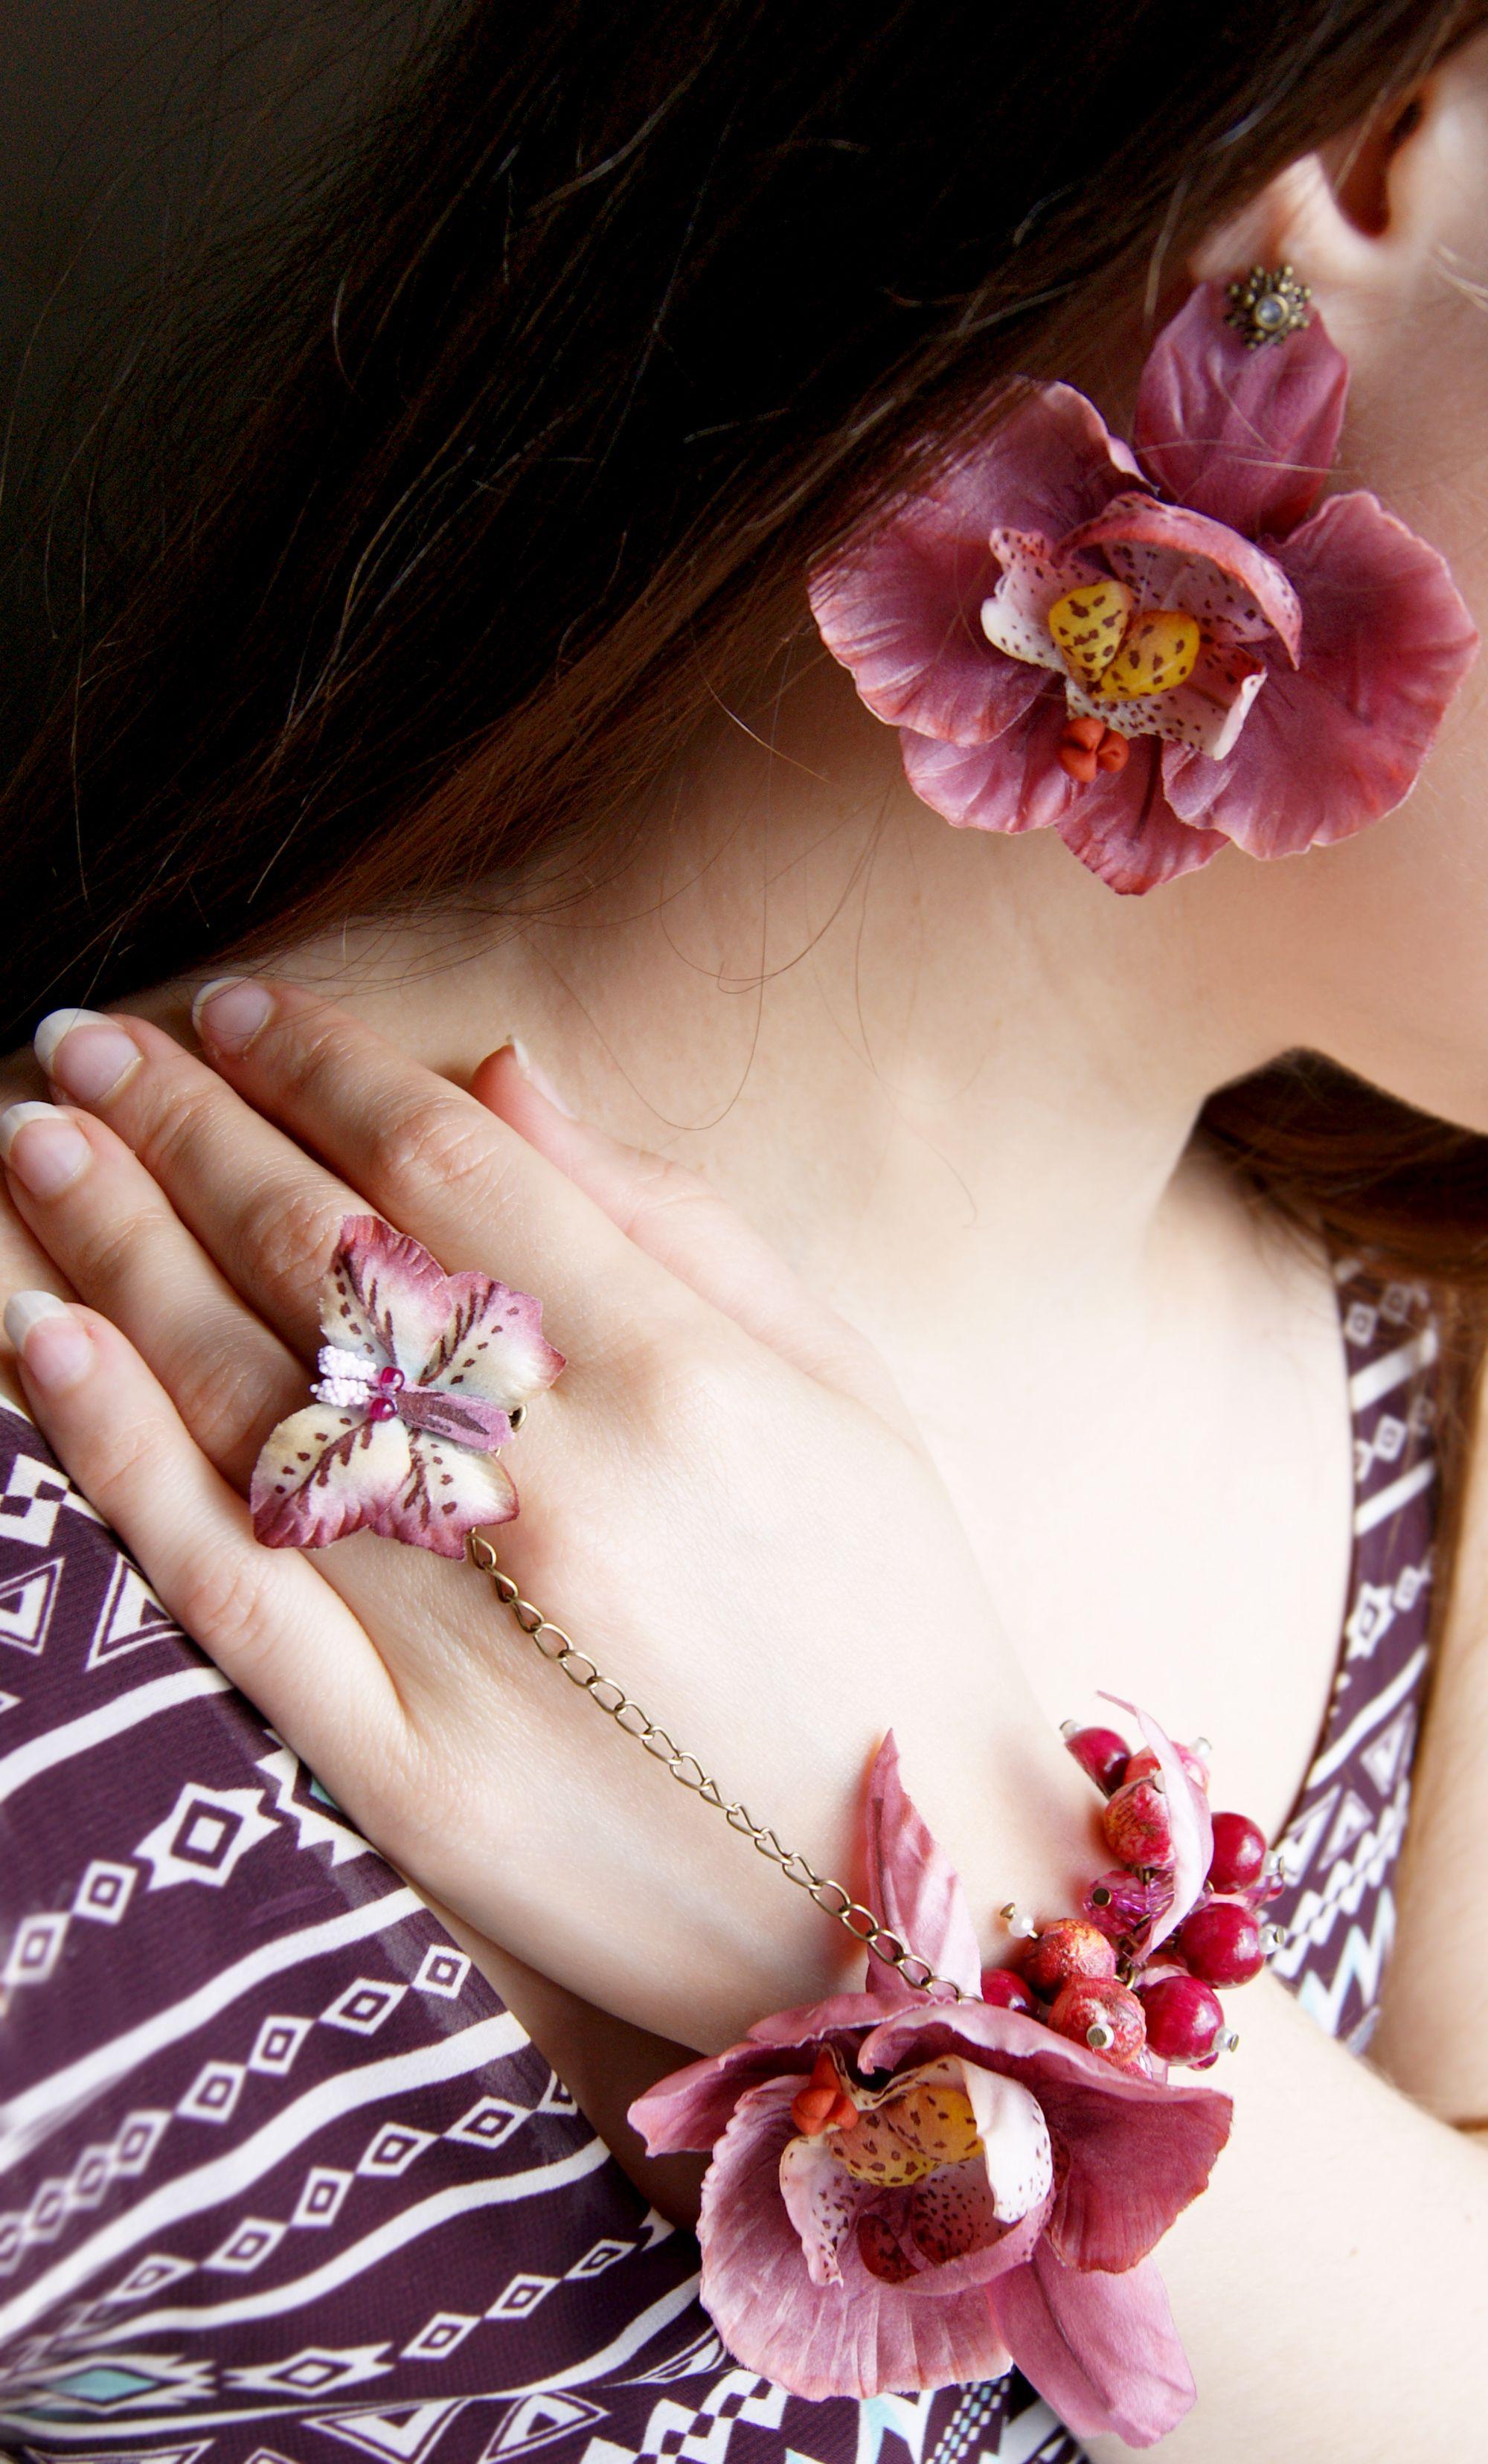 орхидеи аксессуарыручнойработы серьги аксессуары браслет цветыизшелка цветы